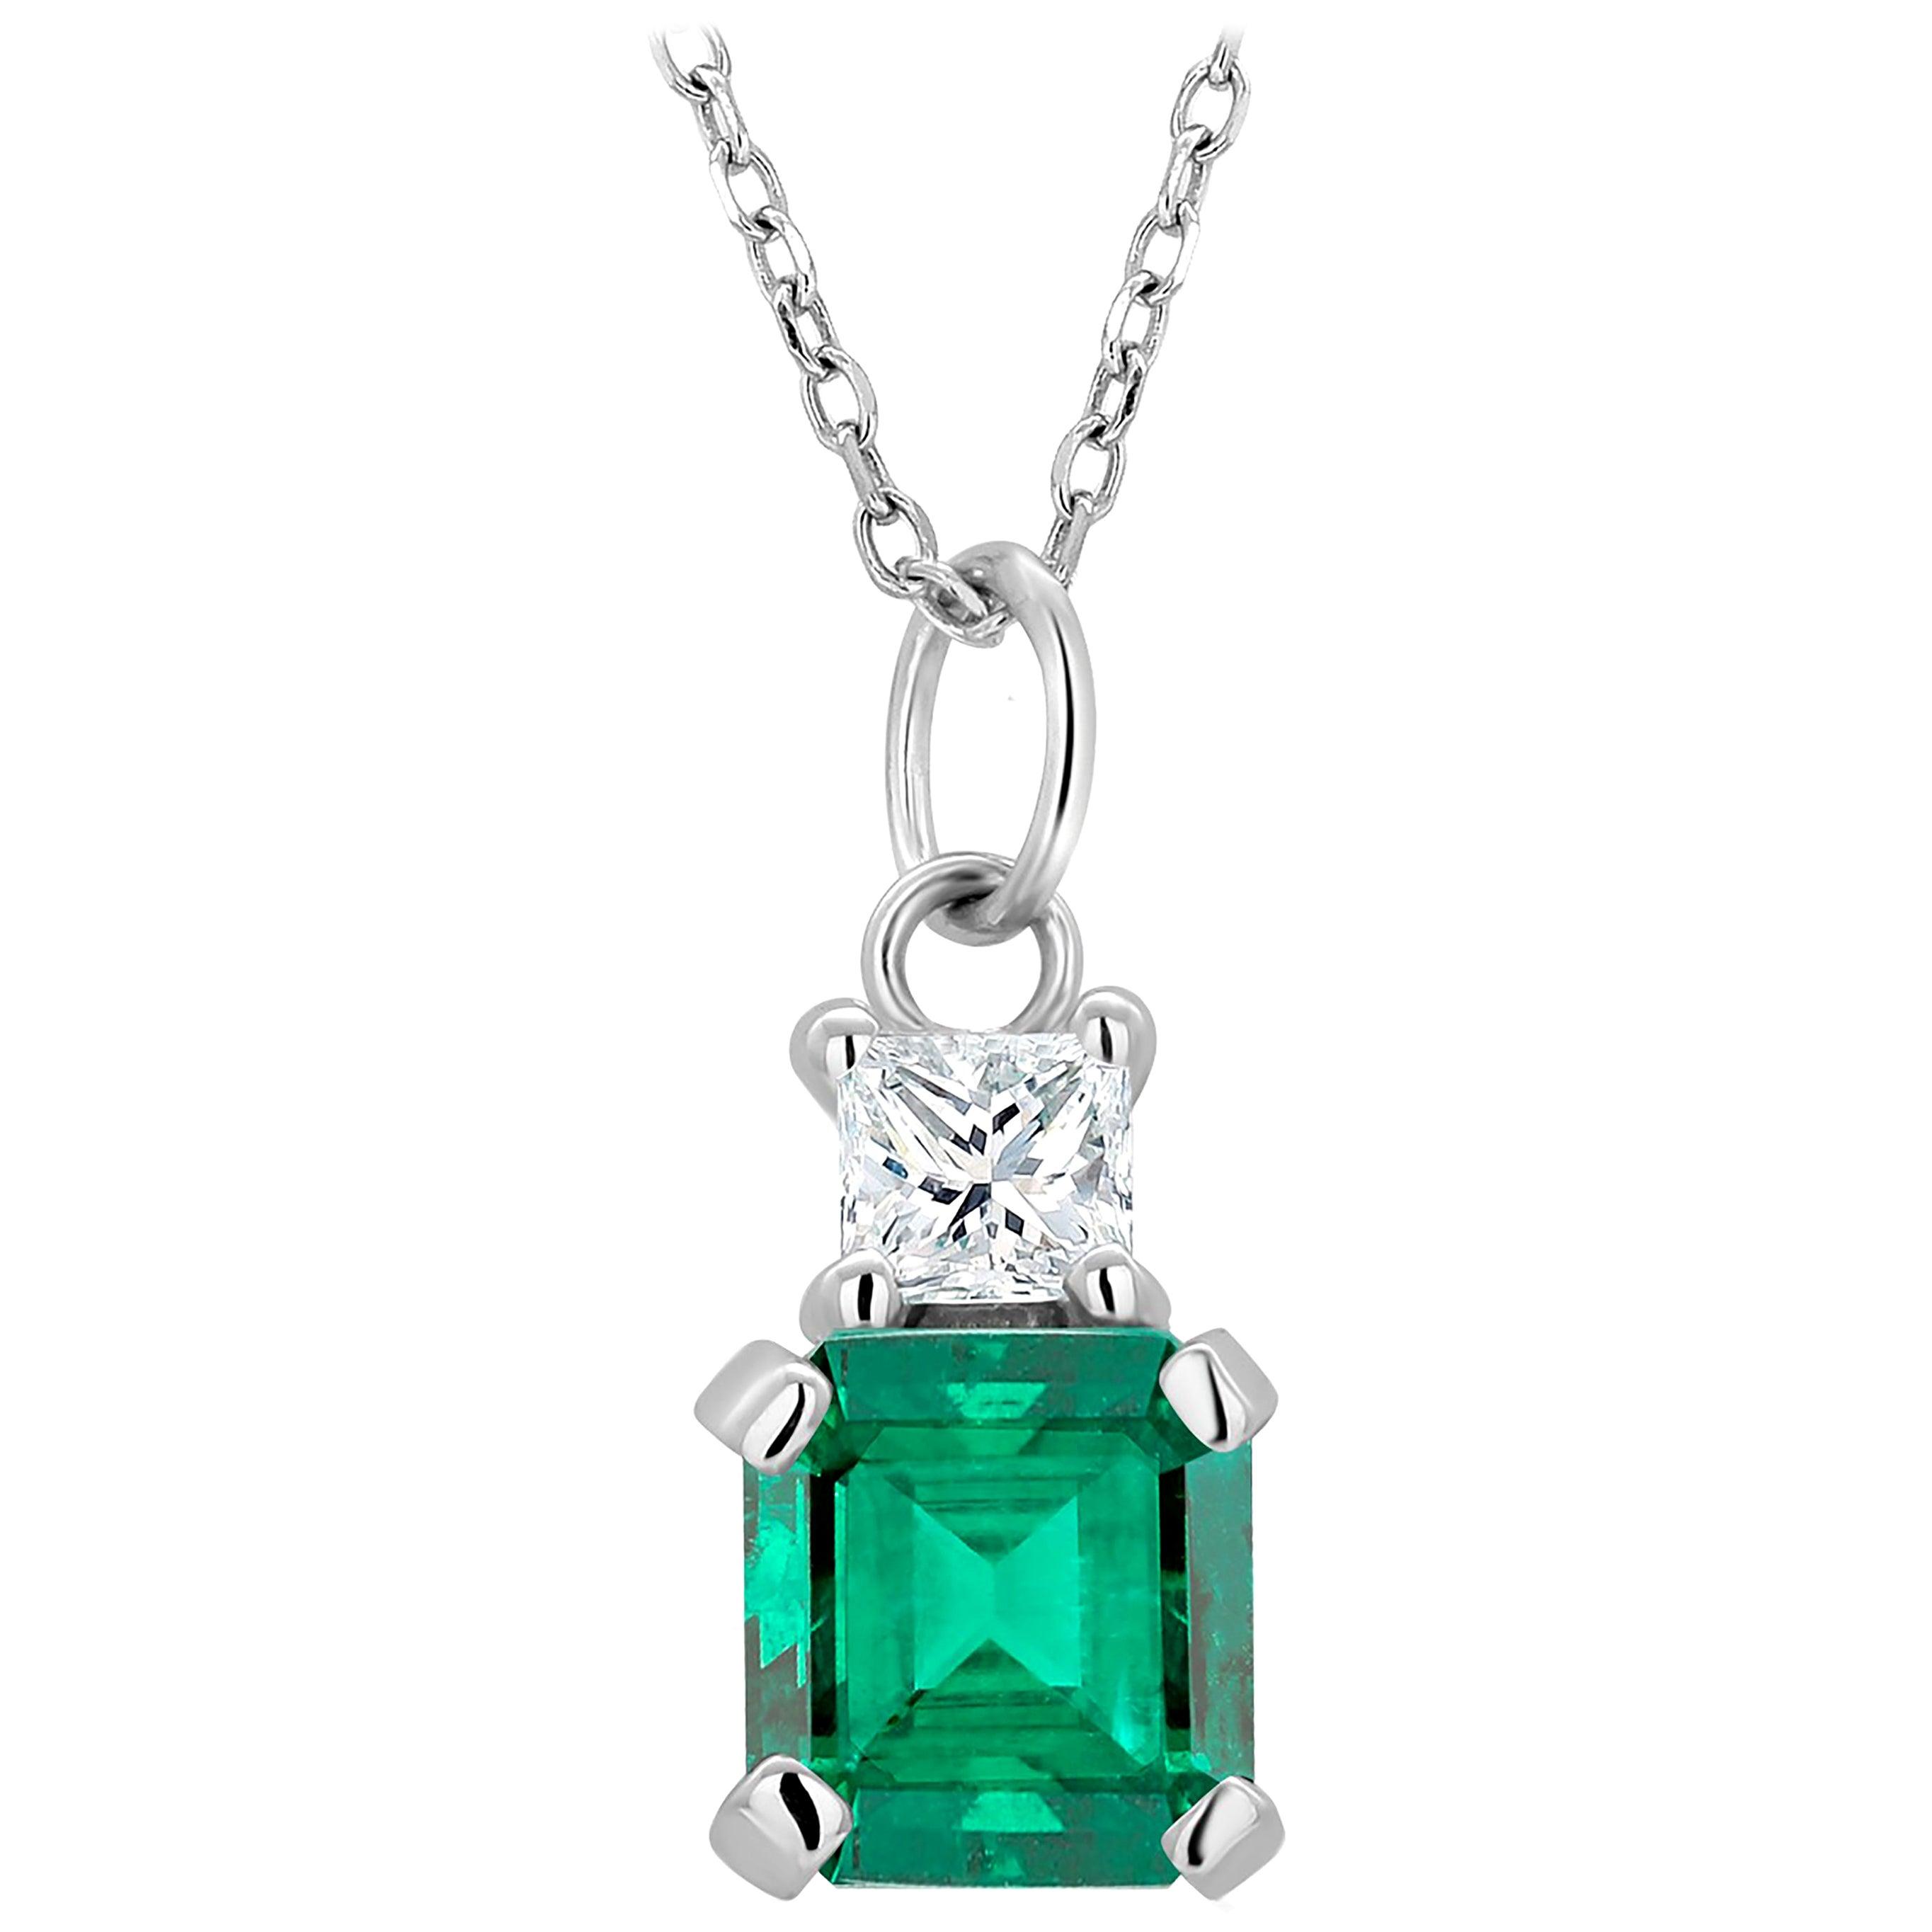 Emerald and Princess Diamond White Gold Drop Pendant Necklace